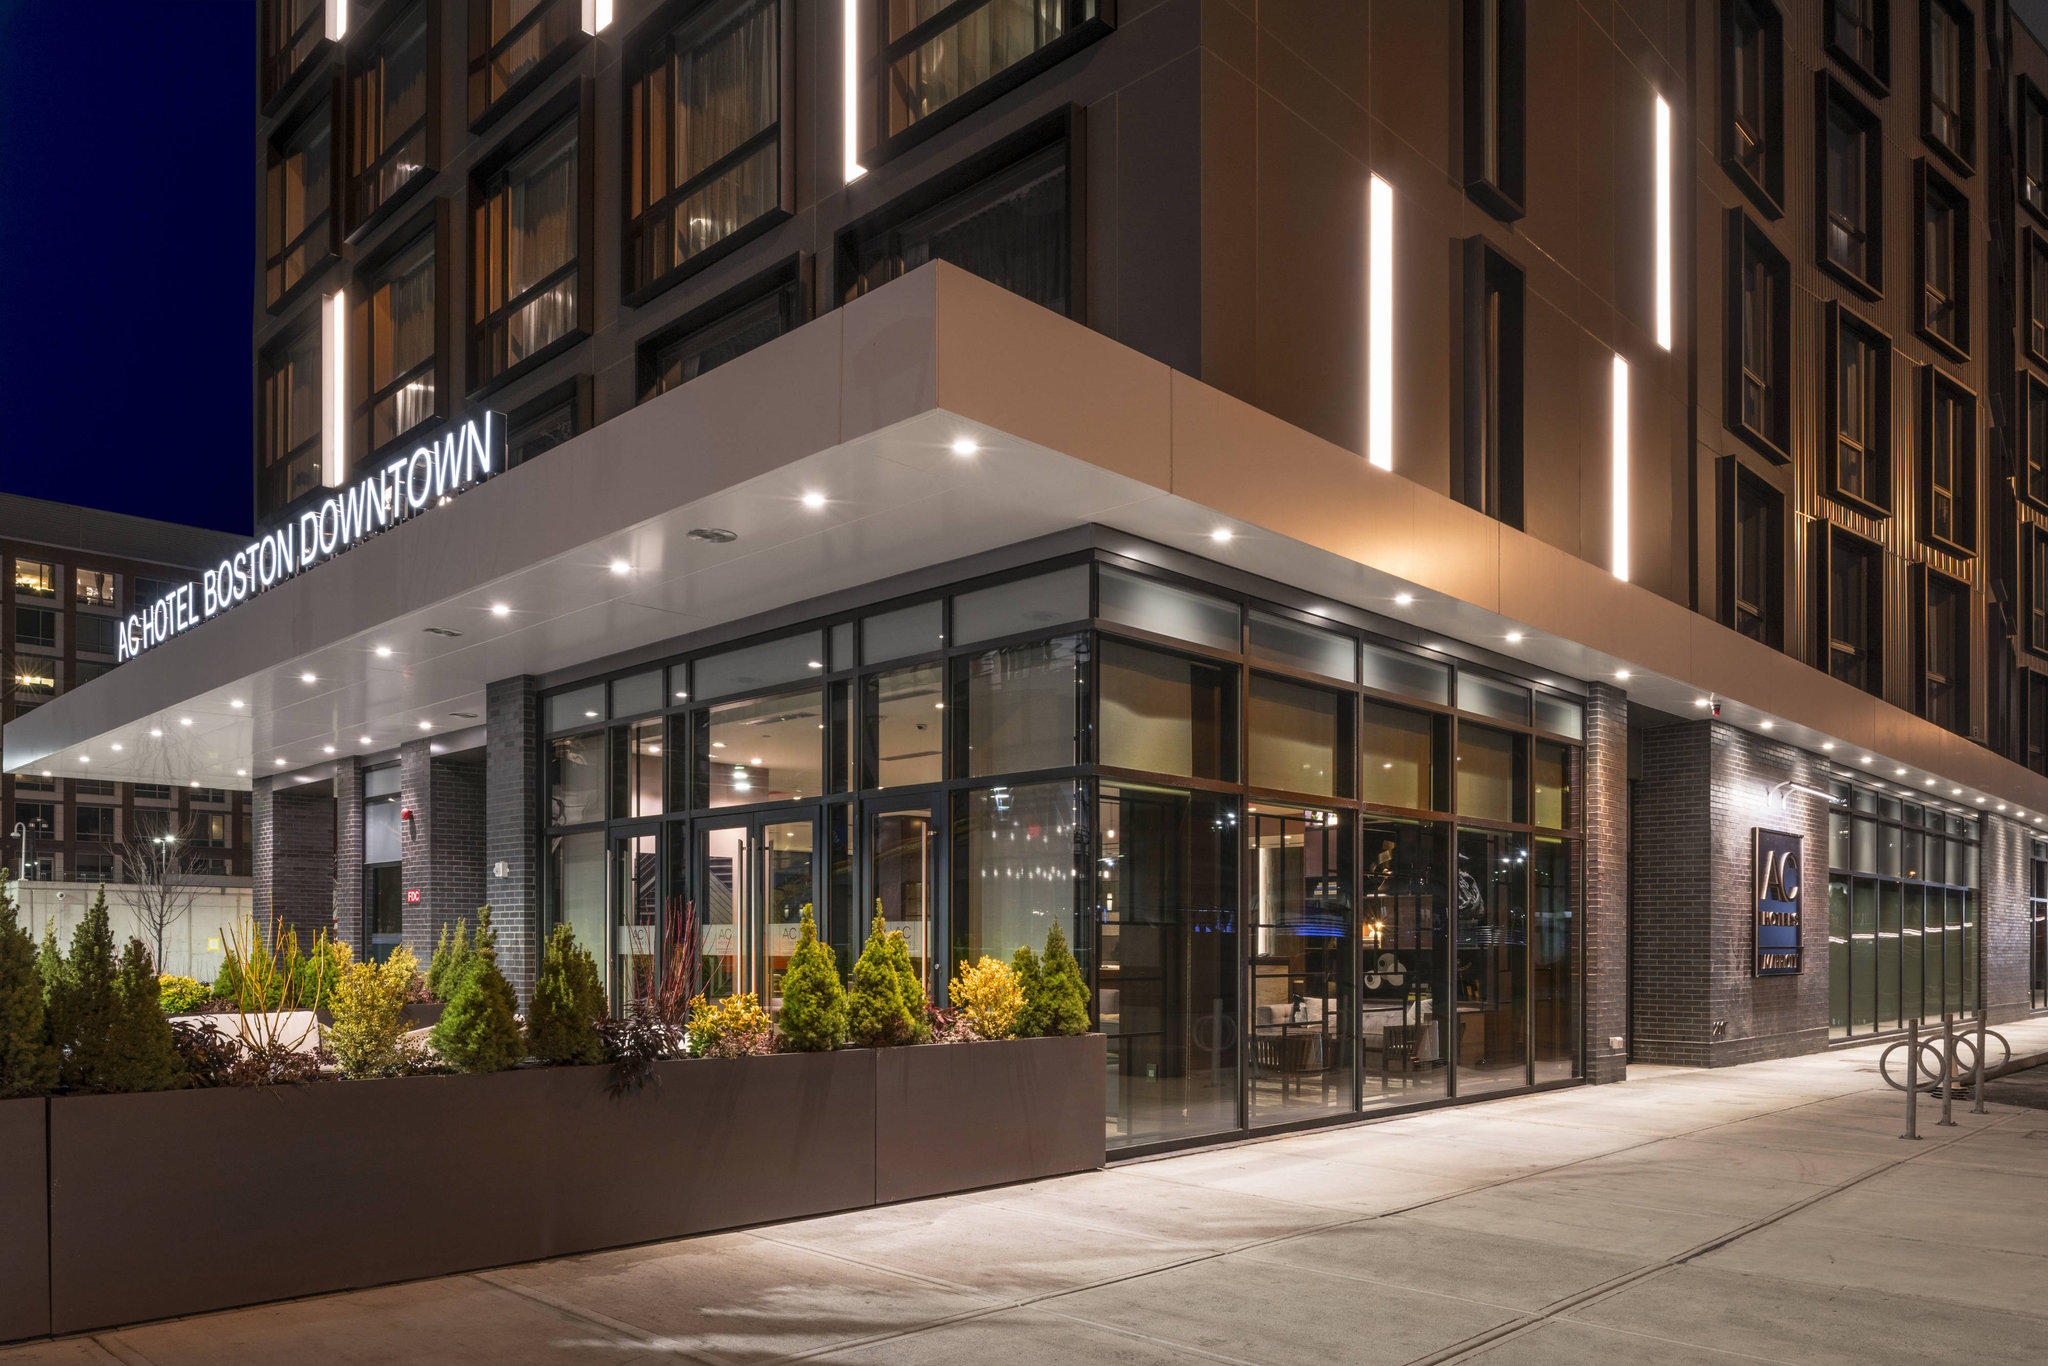 AC Hotel by Marriott Boston Downtown